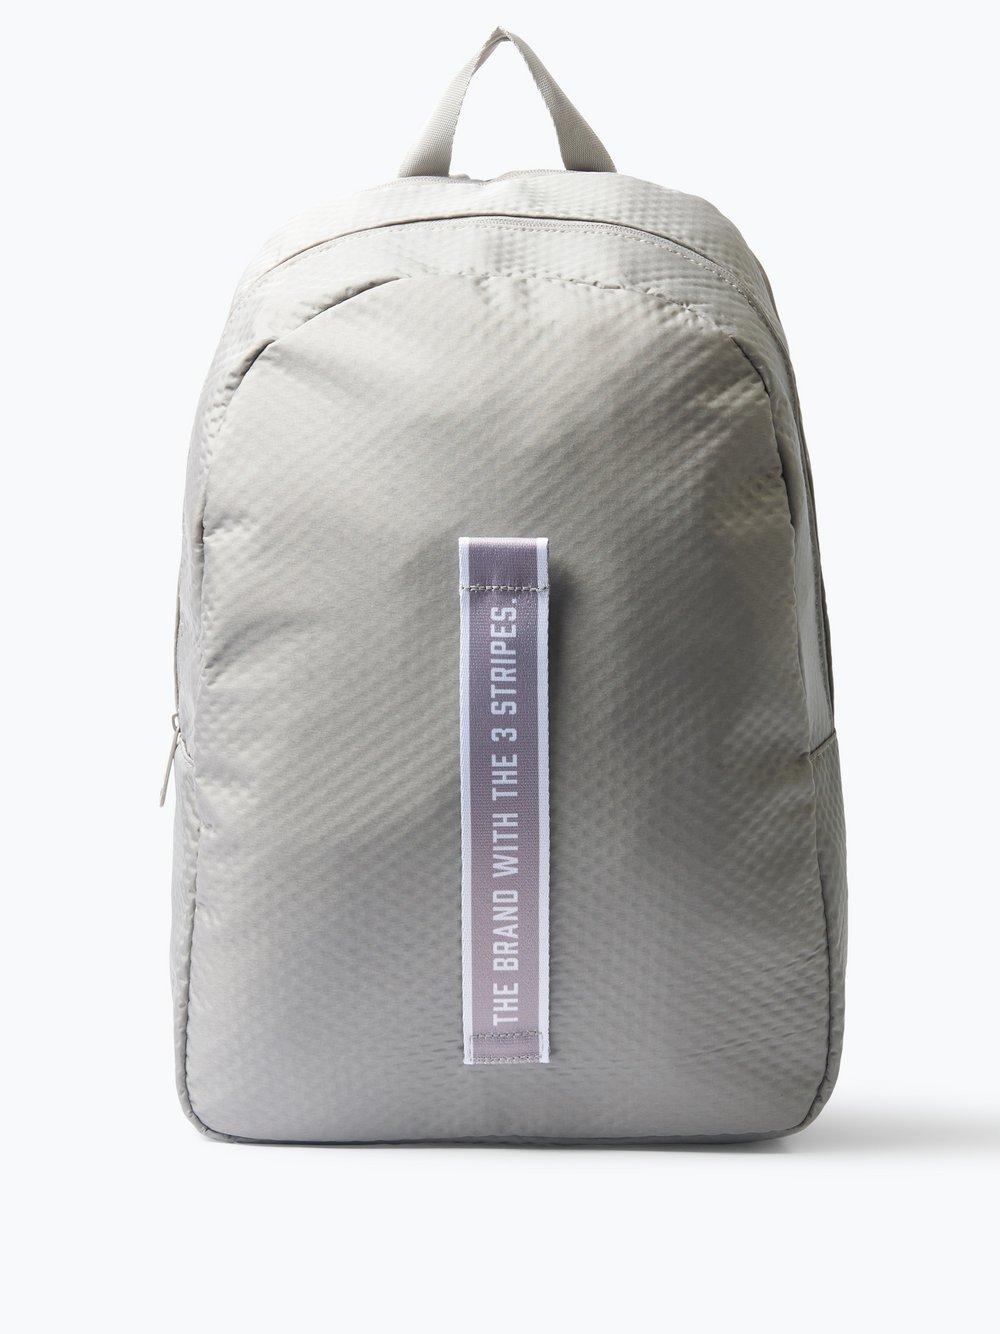 9e14309a0f673 adidas Originals Damen Rucksack online kaufen